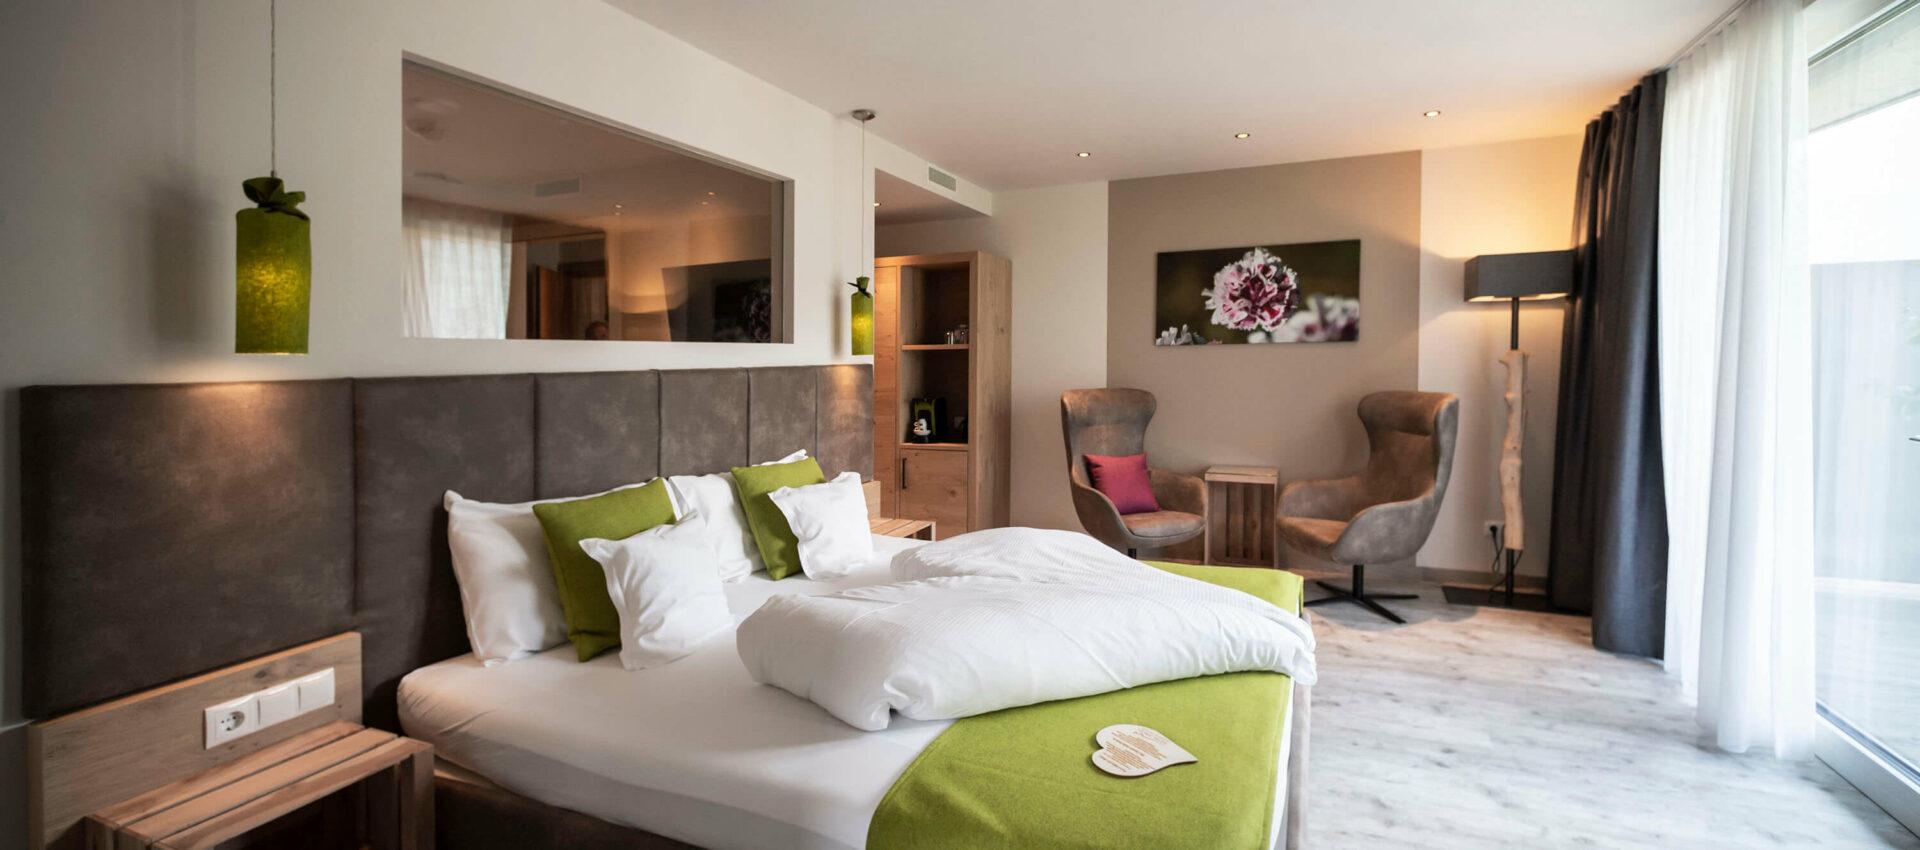 PinkLady Zimmer Neu im Hotel Pfeiss in Lana, bei Meran